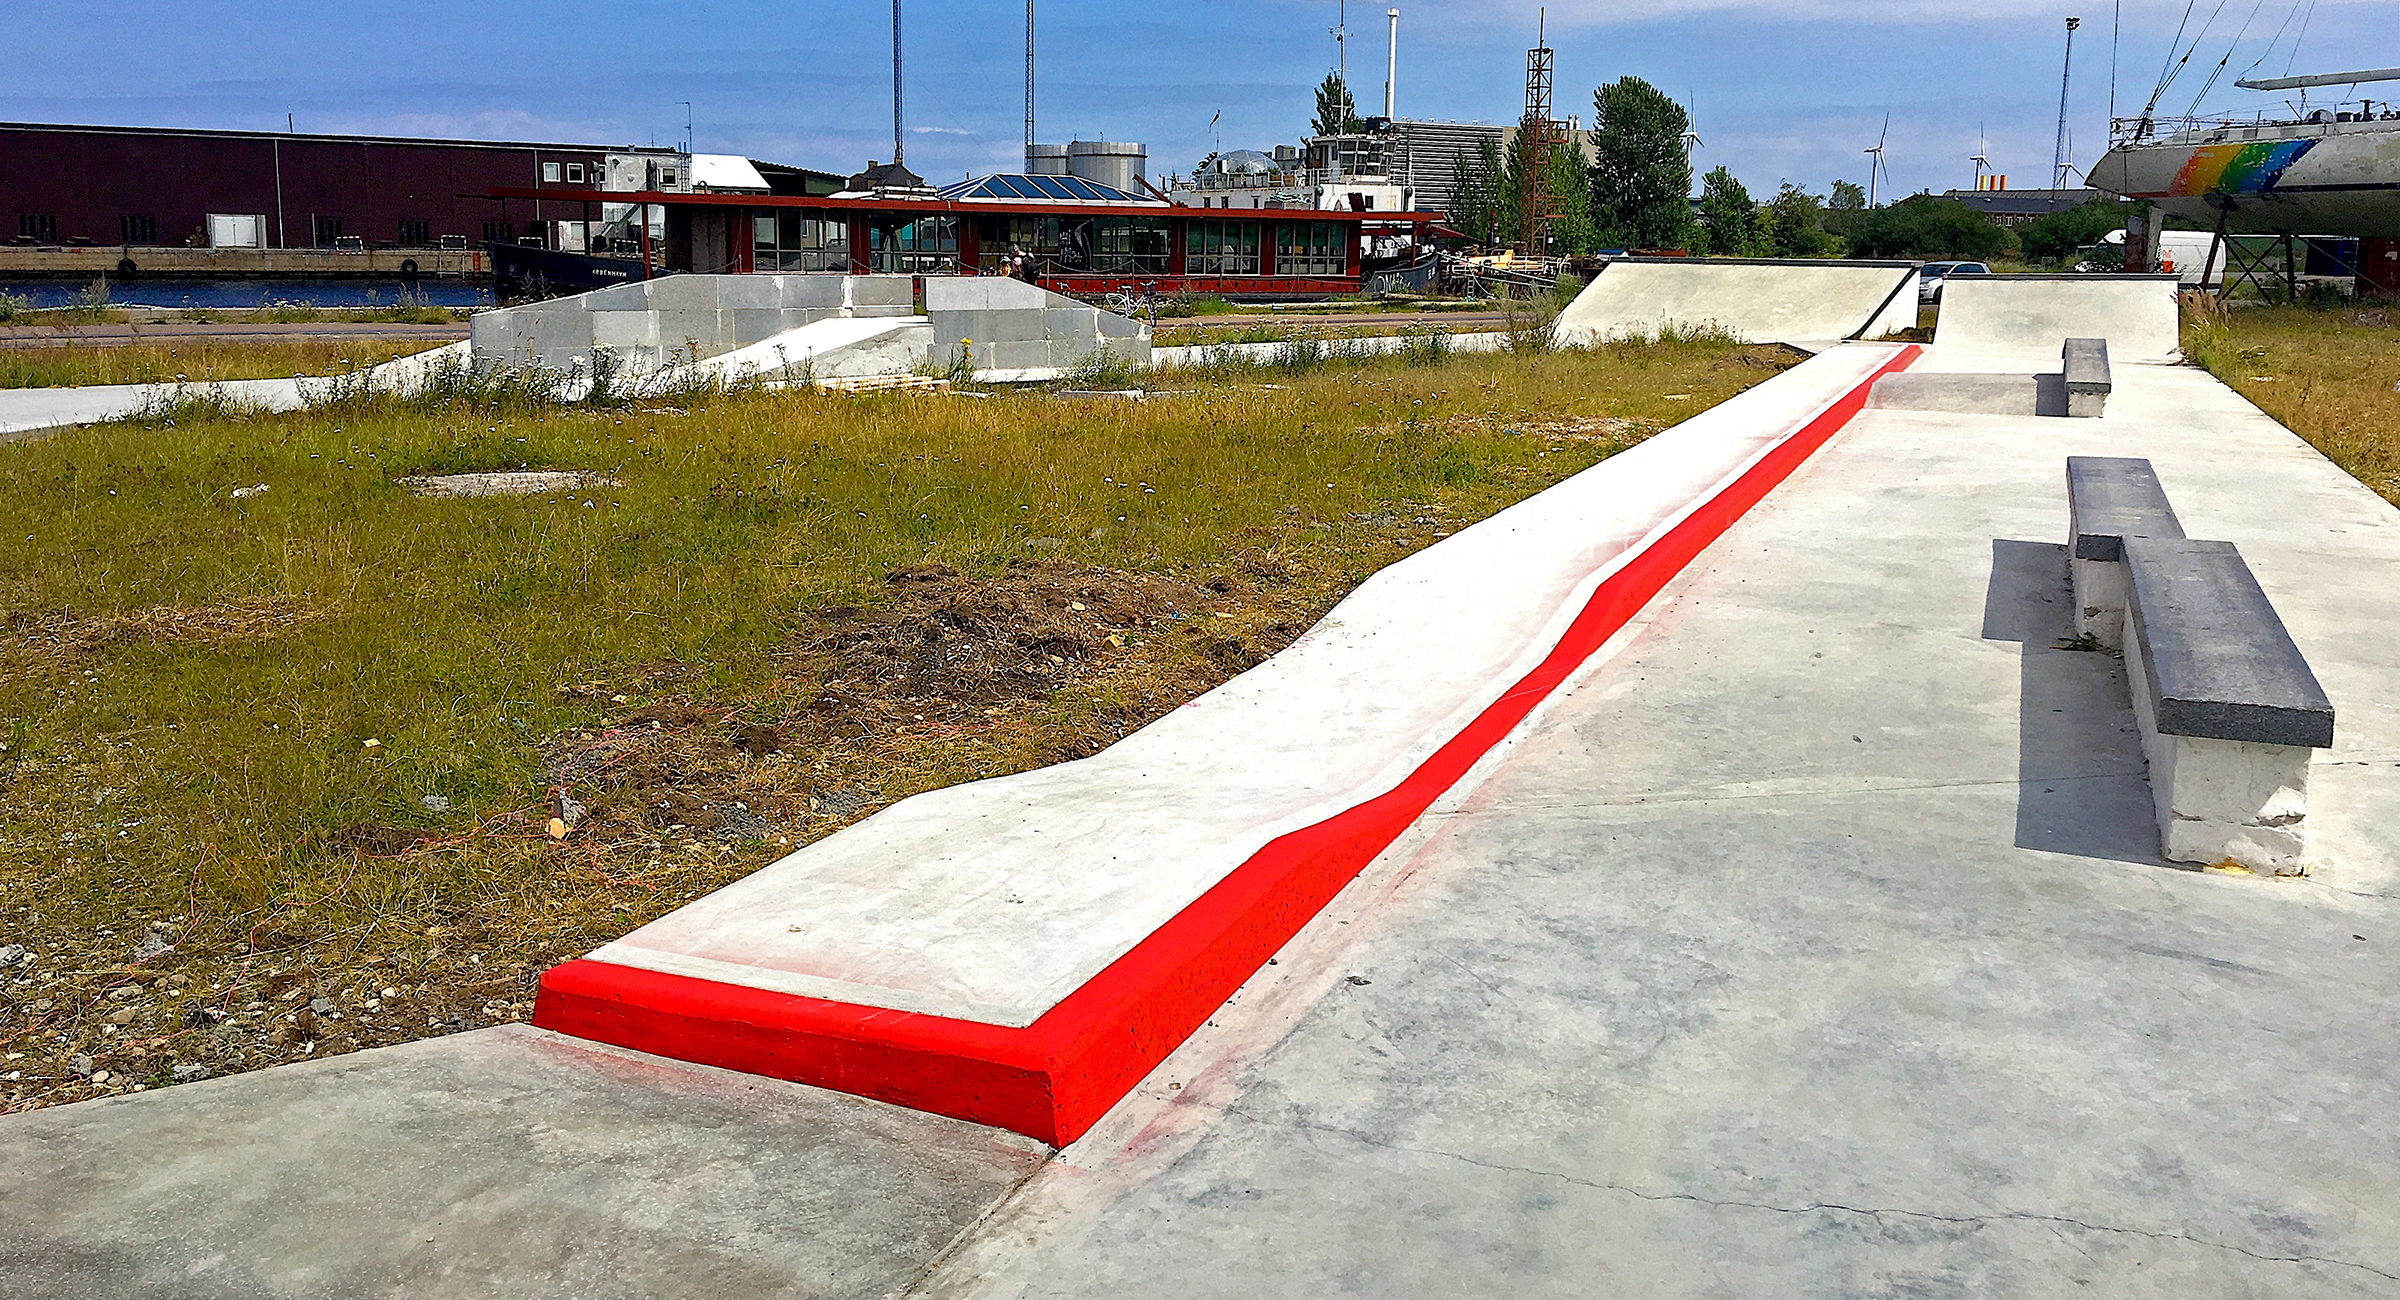 En lang curb i beton med rødmalet kant